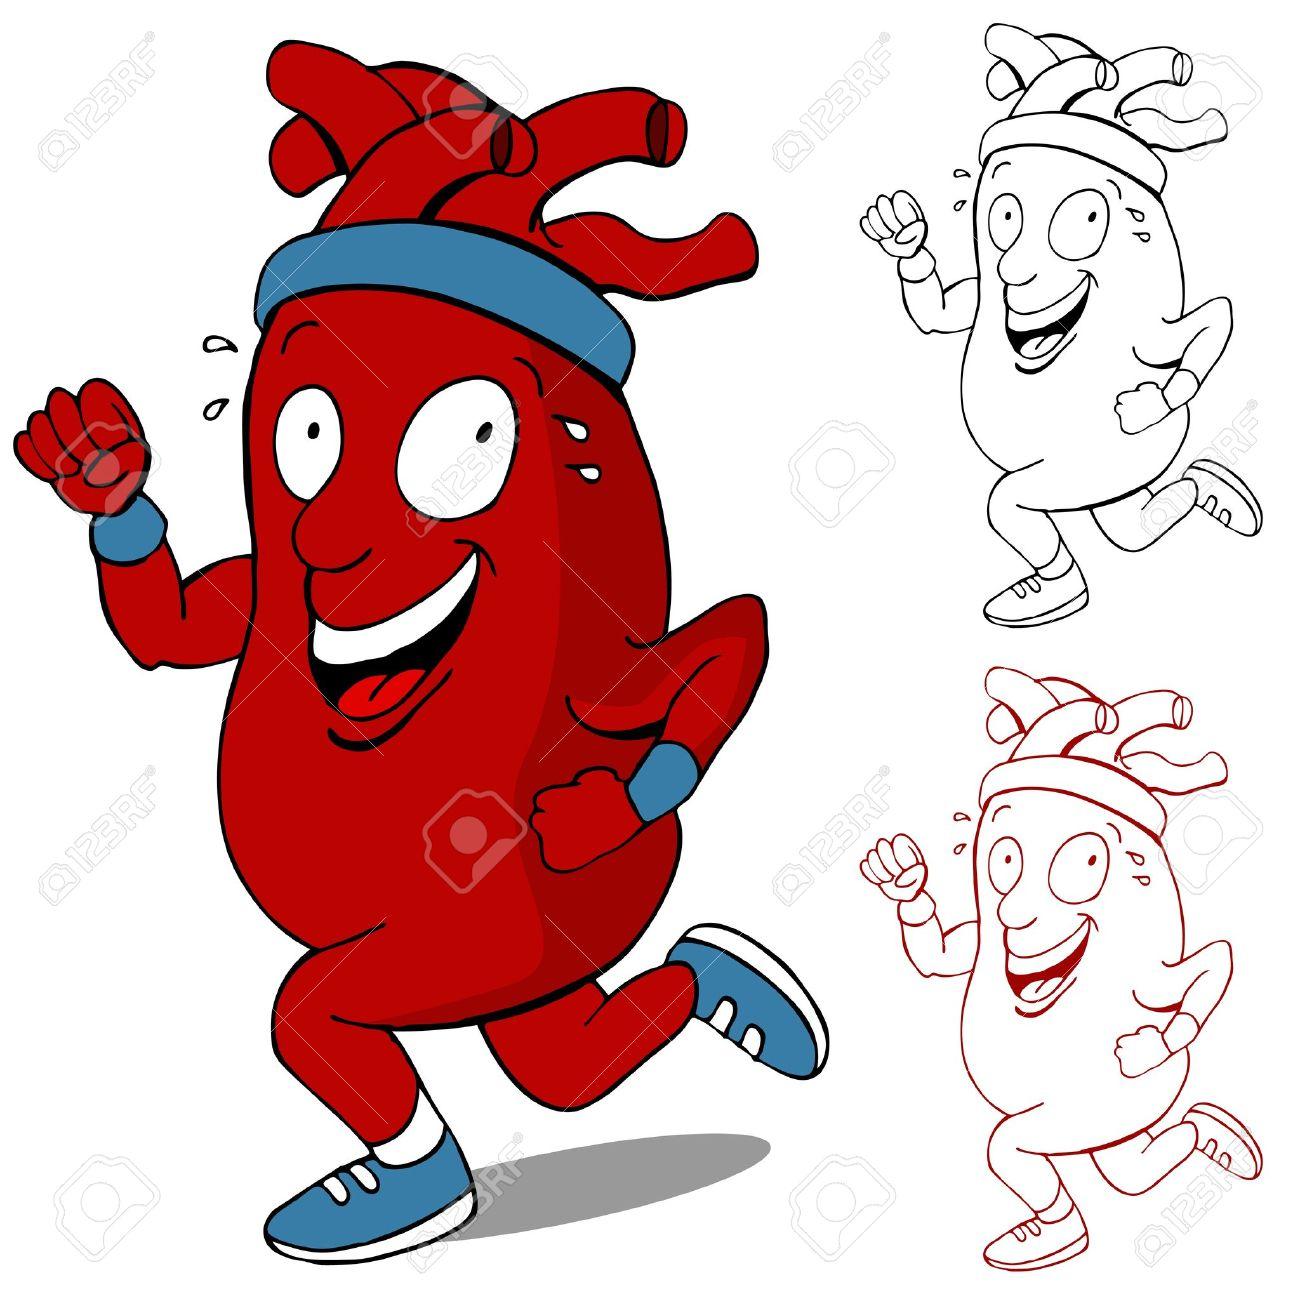 An image of a healthy heart running cartoon character. Stock Vector - 10302338